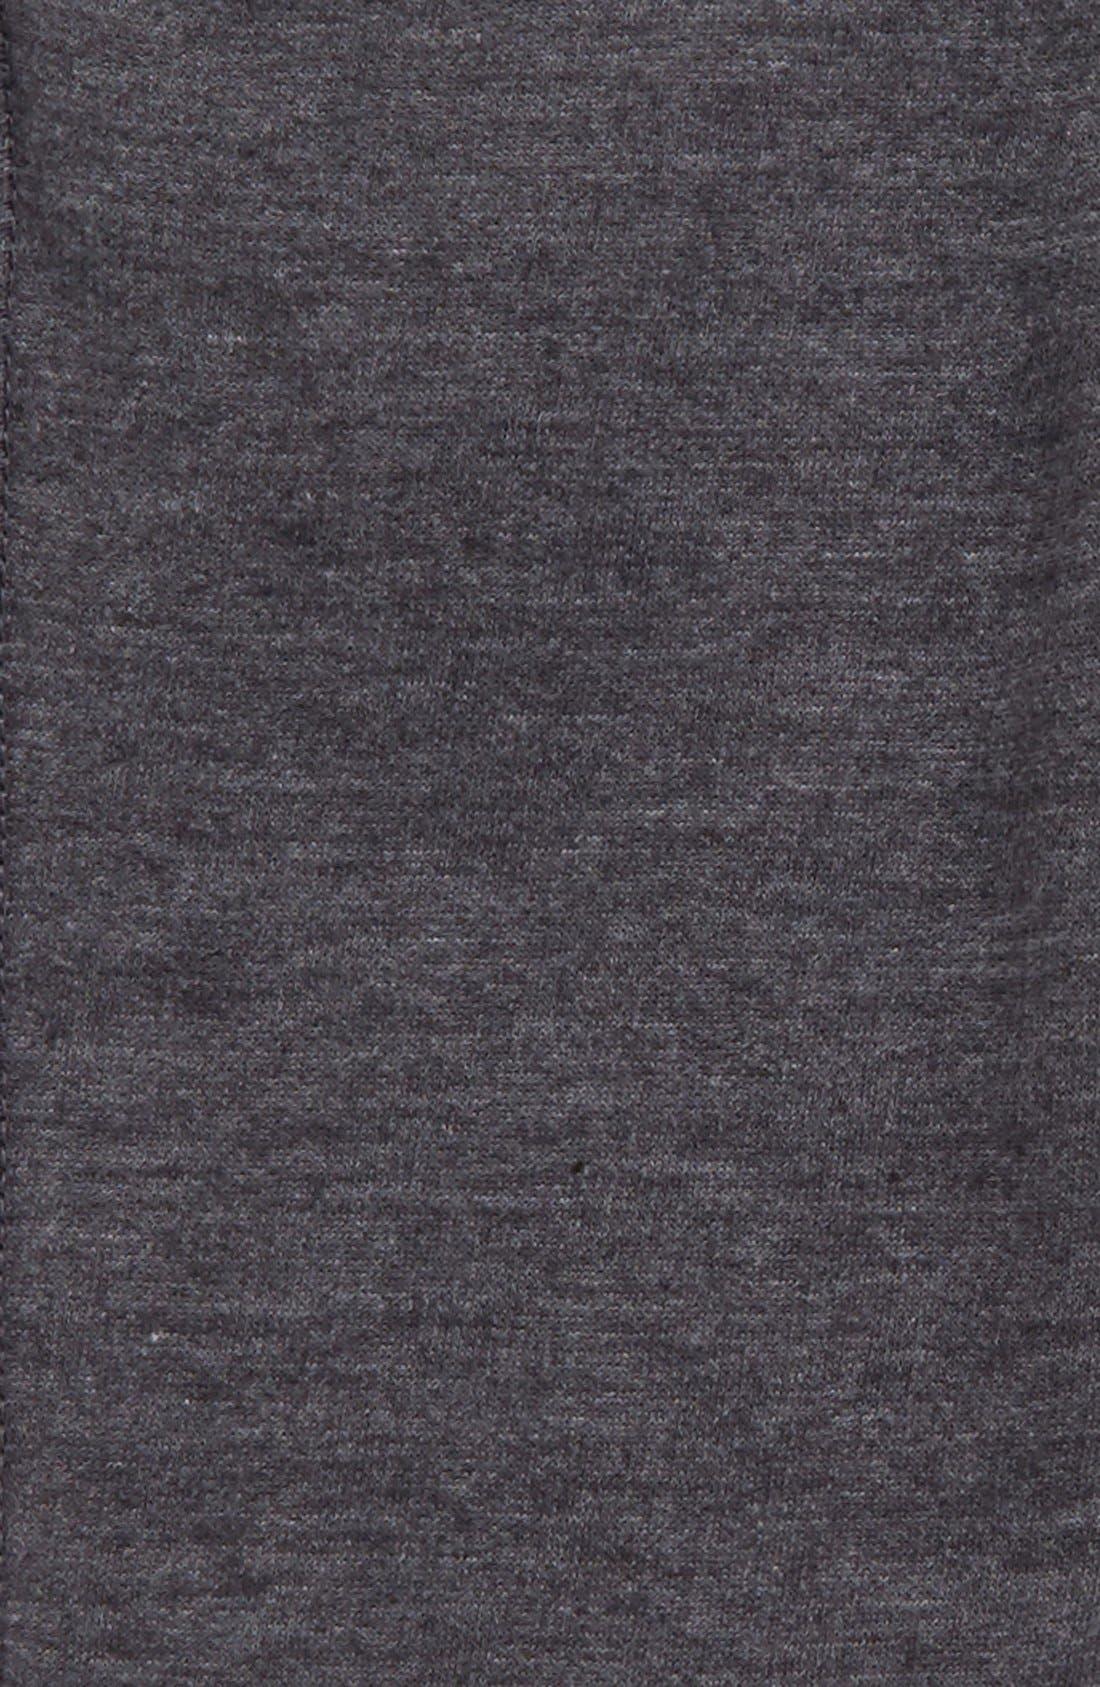 Fleece Sweatpants,                             Alternate thumbnail 3, color,                             GREY CHARCOAL HEATHER